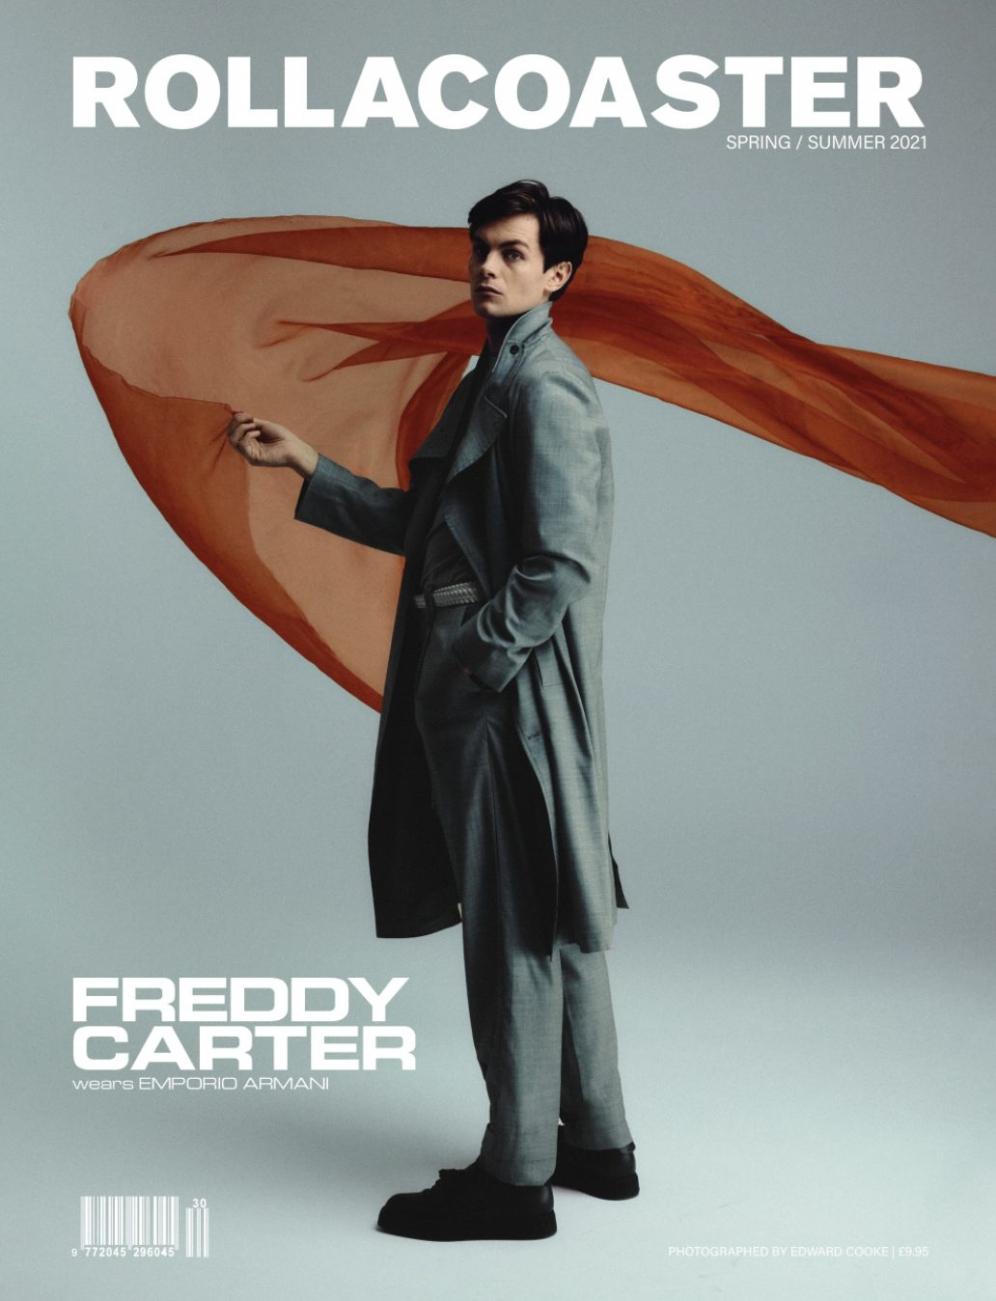 Freddy Carter | Rollacoaster